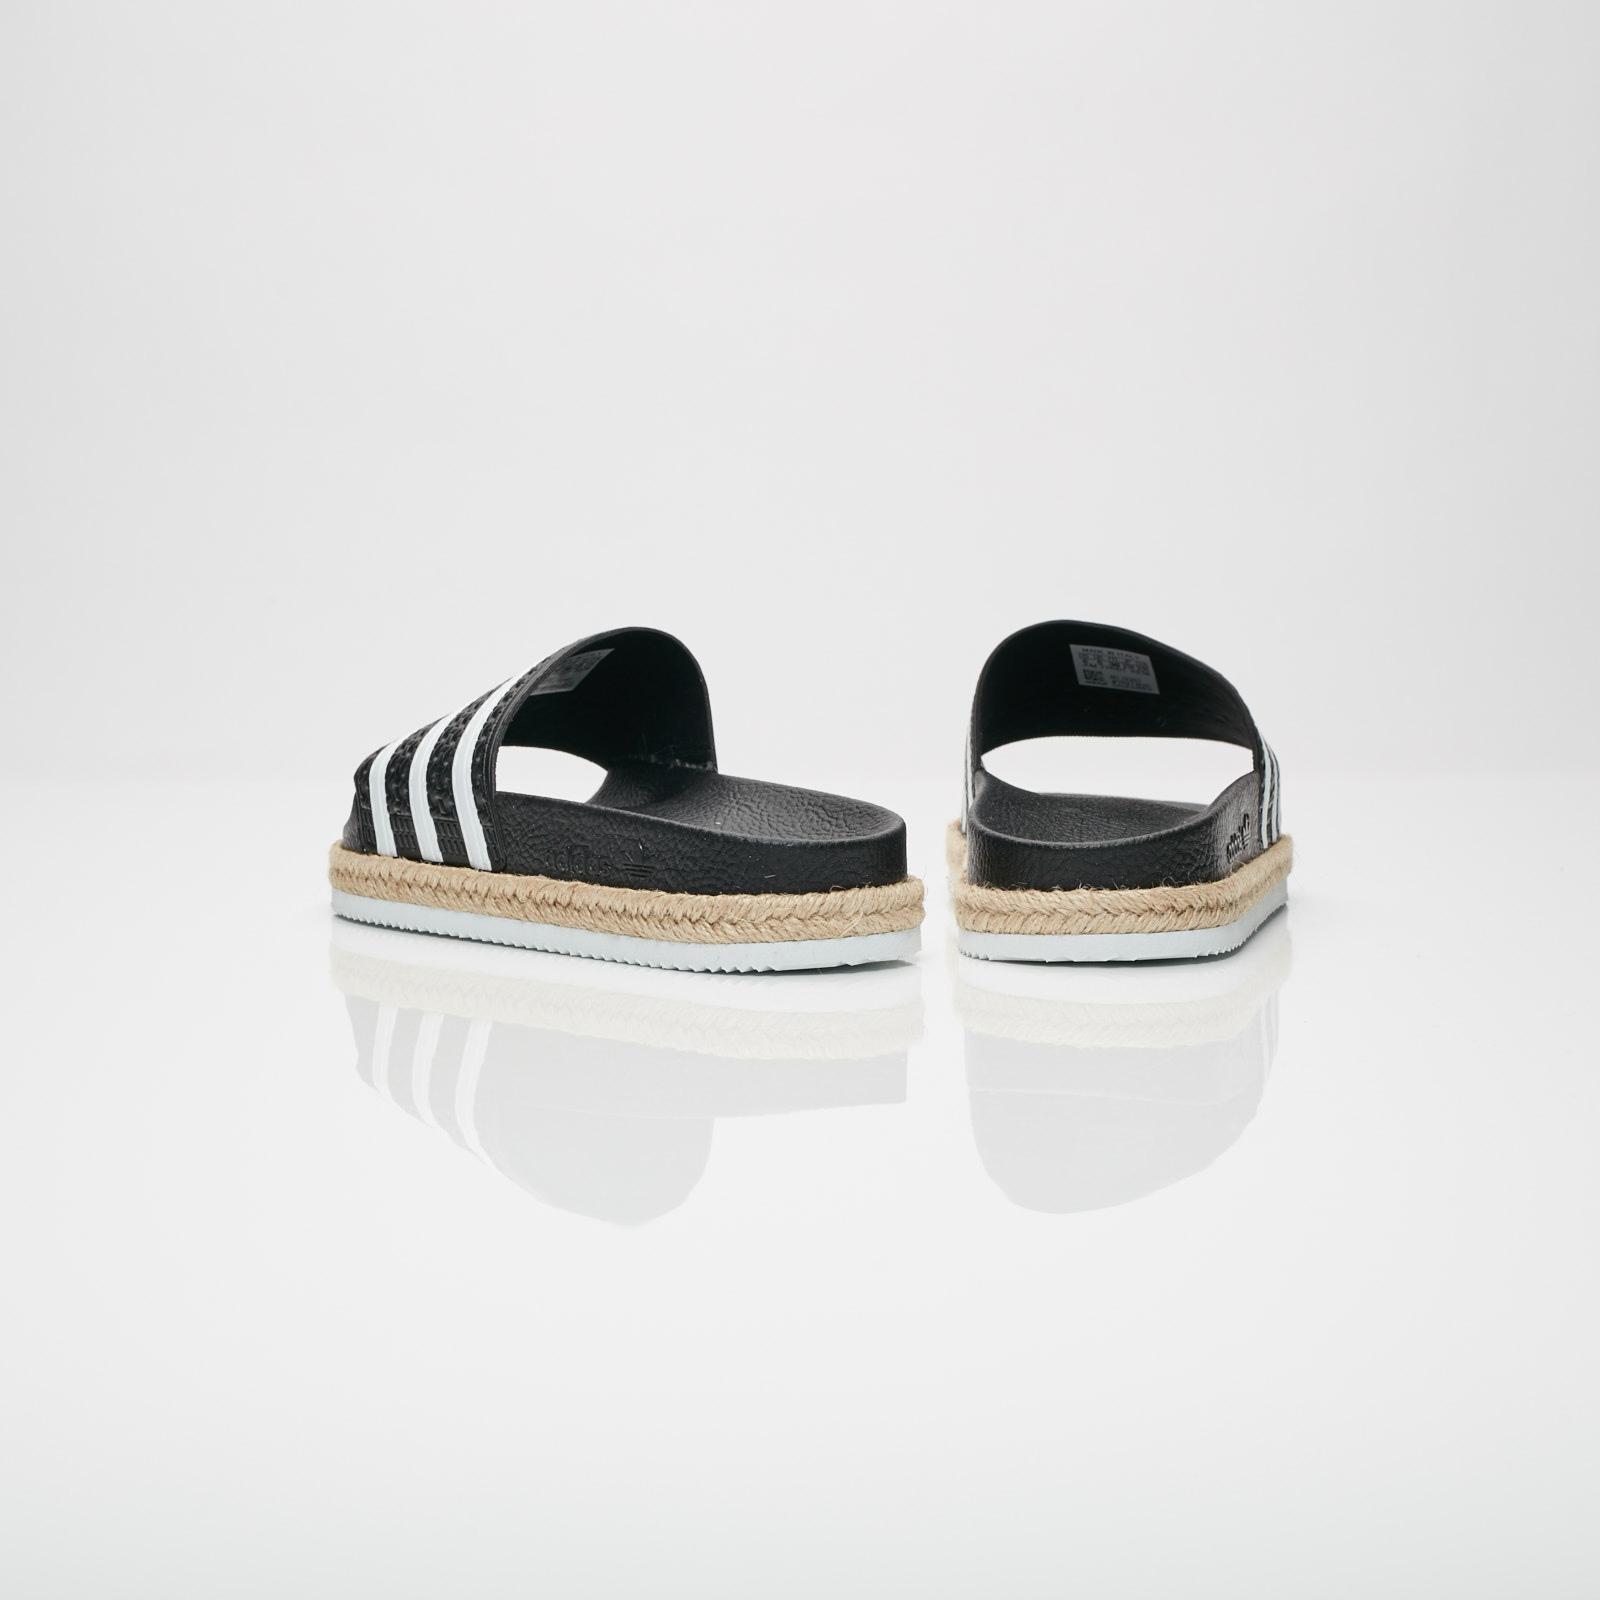 65345881cb2a adidas Adilette New Bold W - Cq3093 - Sneakersnstuff